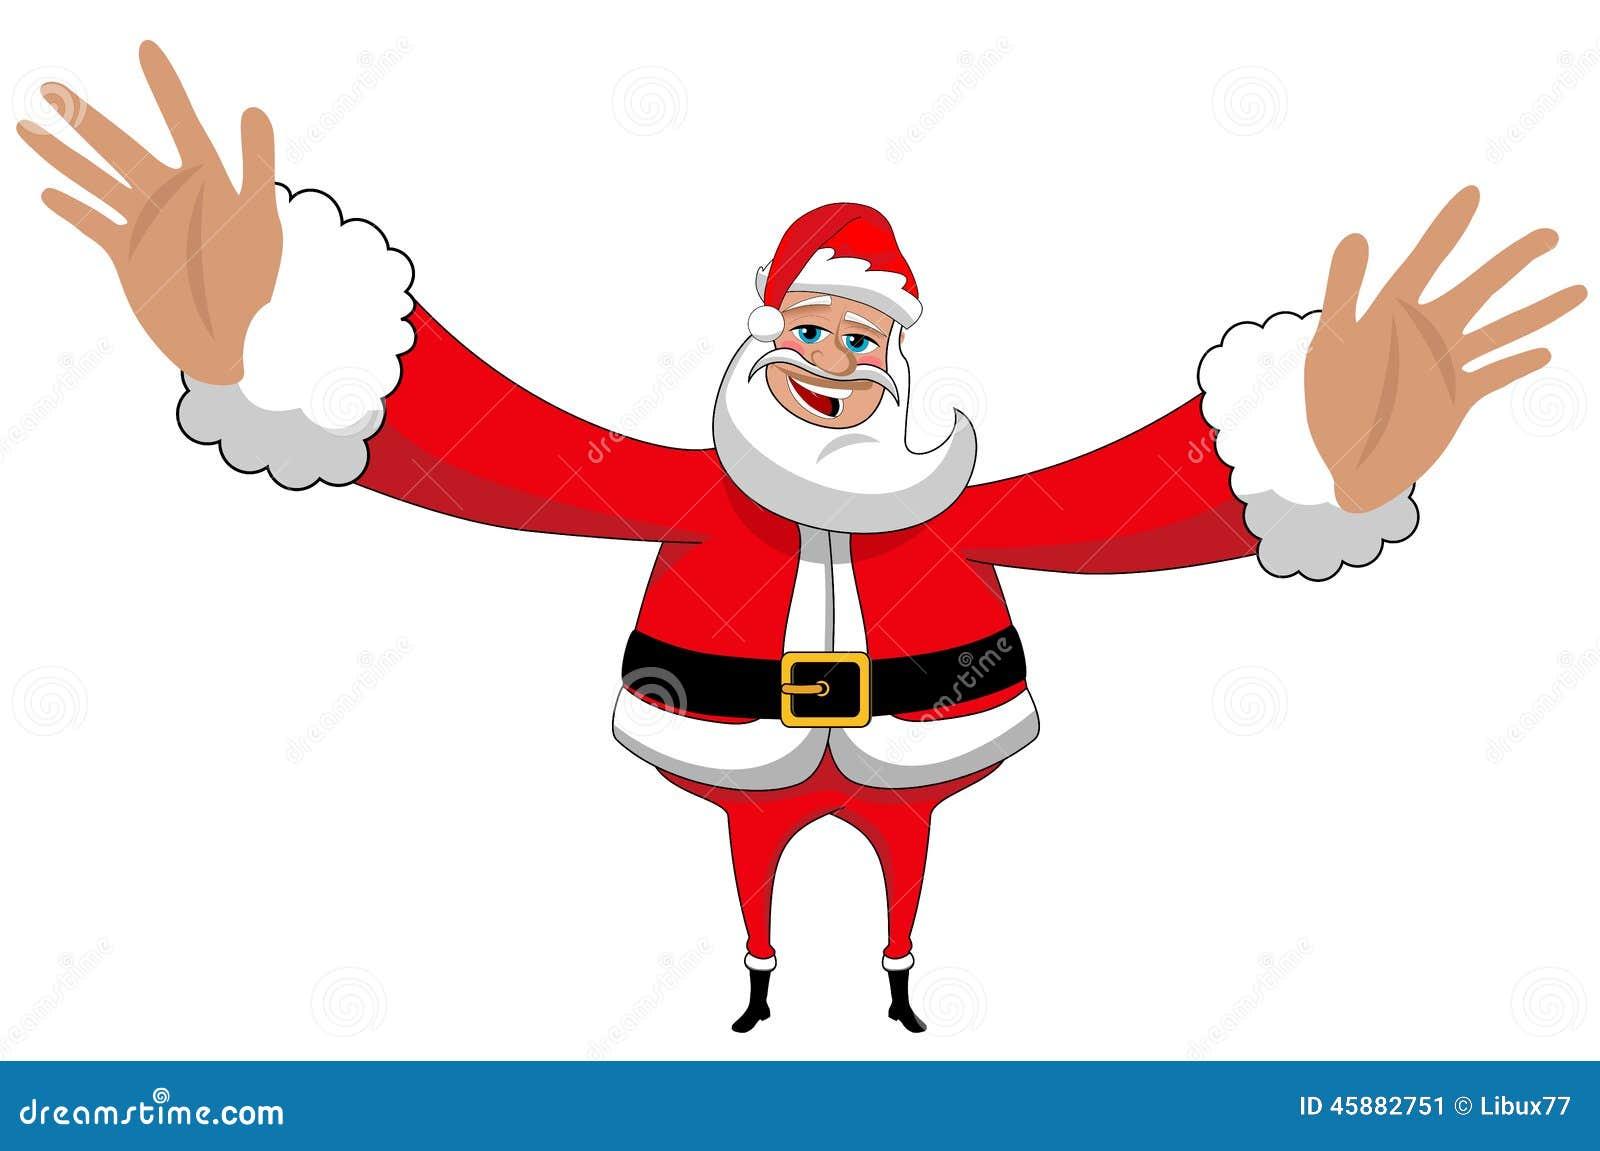 Santa Claus Happy Big Hug Love Xmas Isolated Stock Vector - Image ...